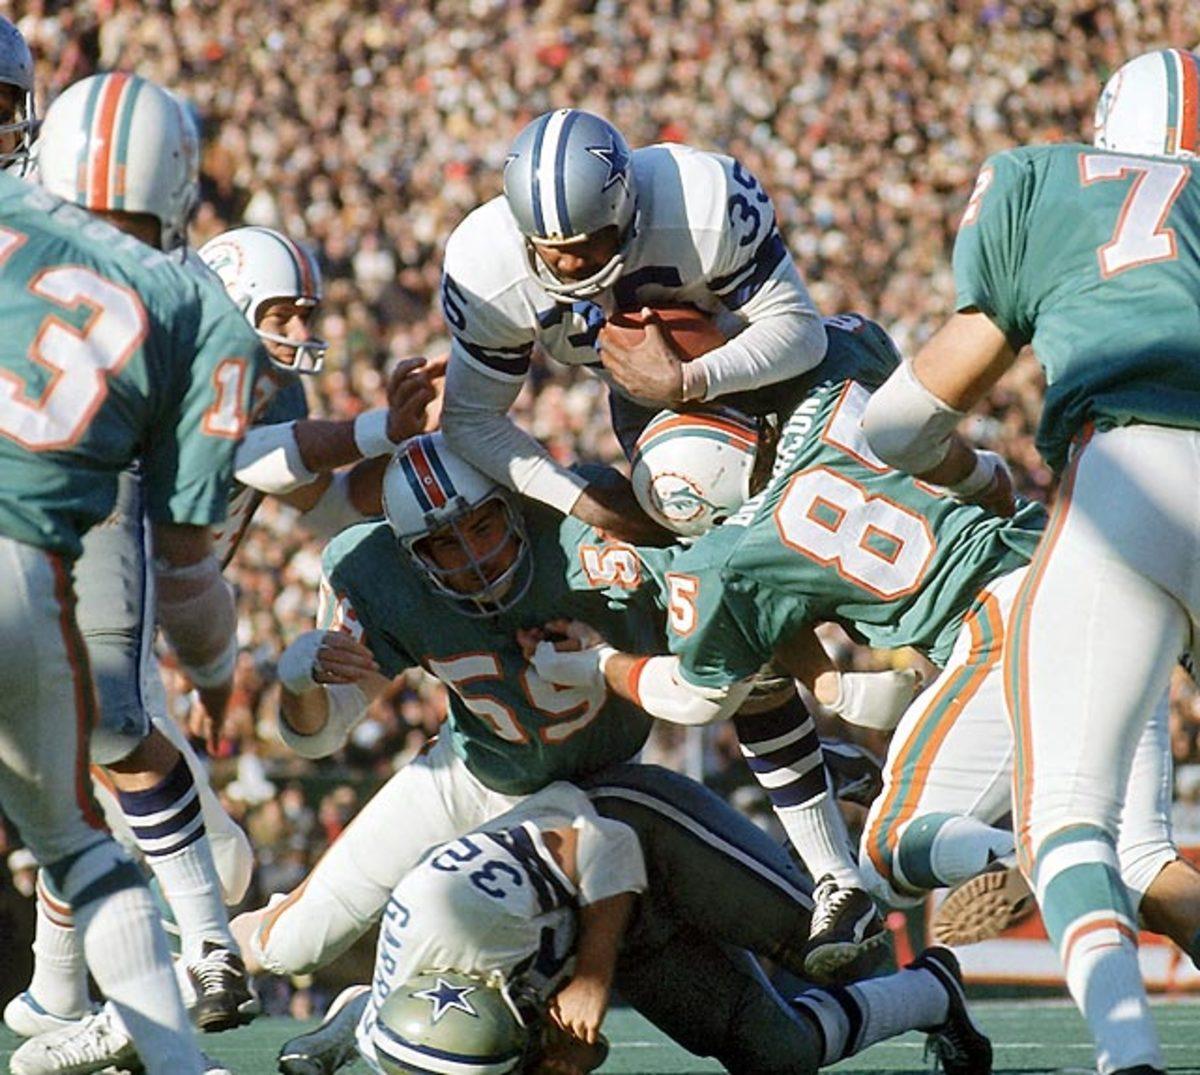 Super Bowl VI, Jan. 16, 1972